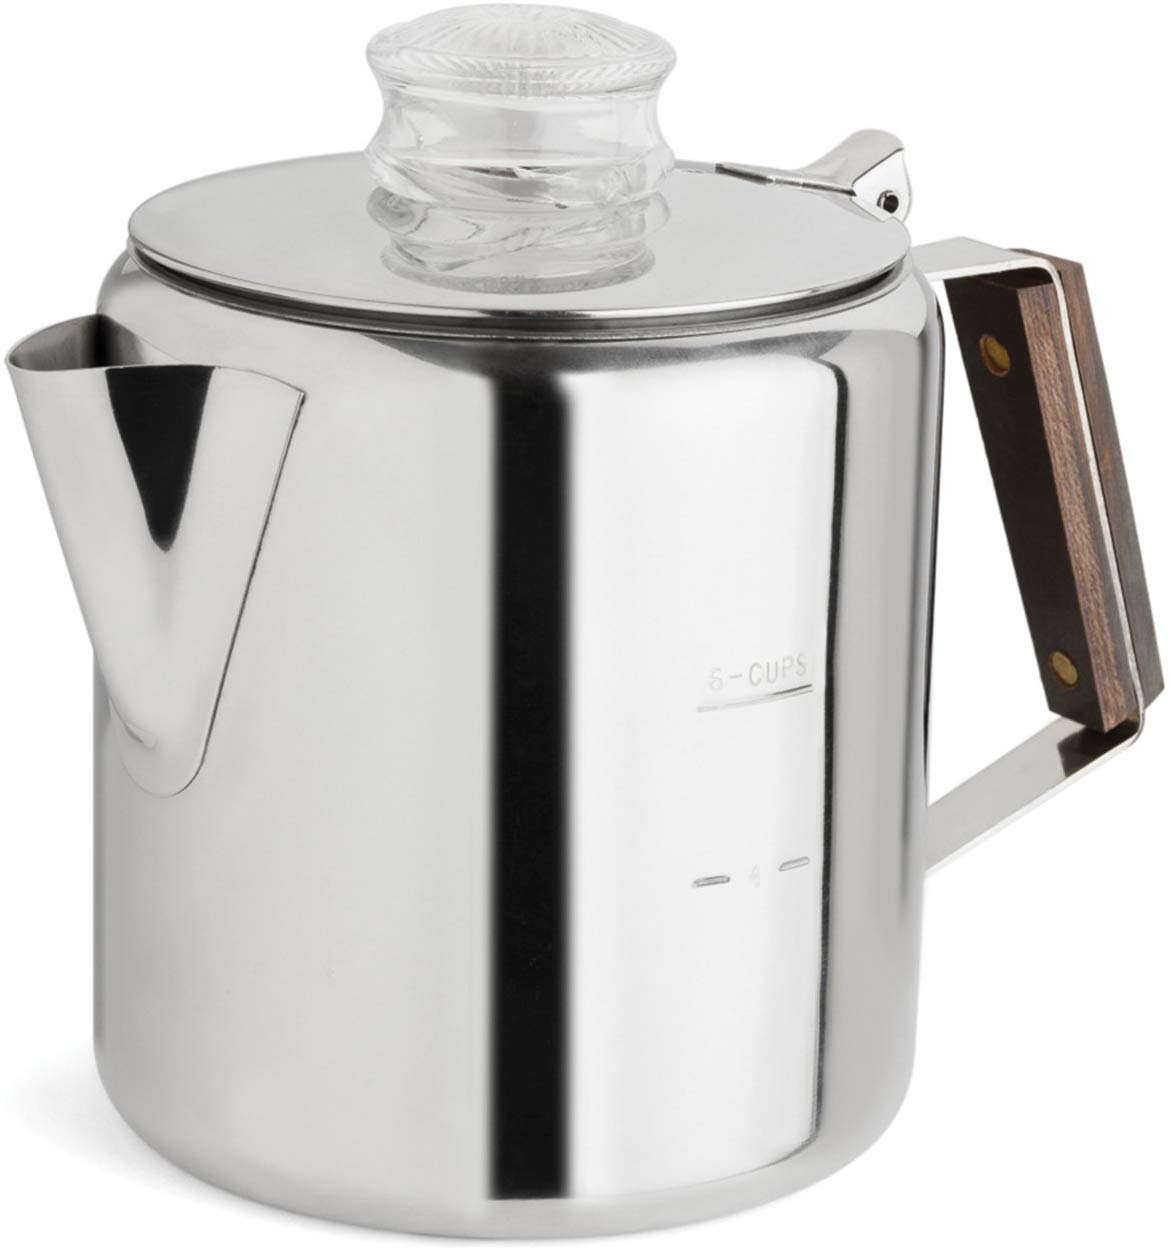 Rapid Brew Stovetop Coffee Percolator